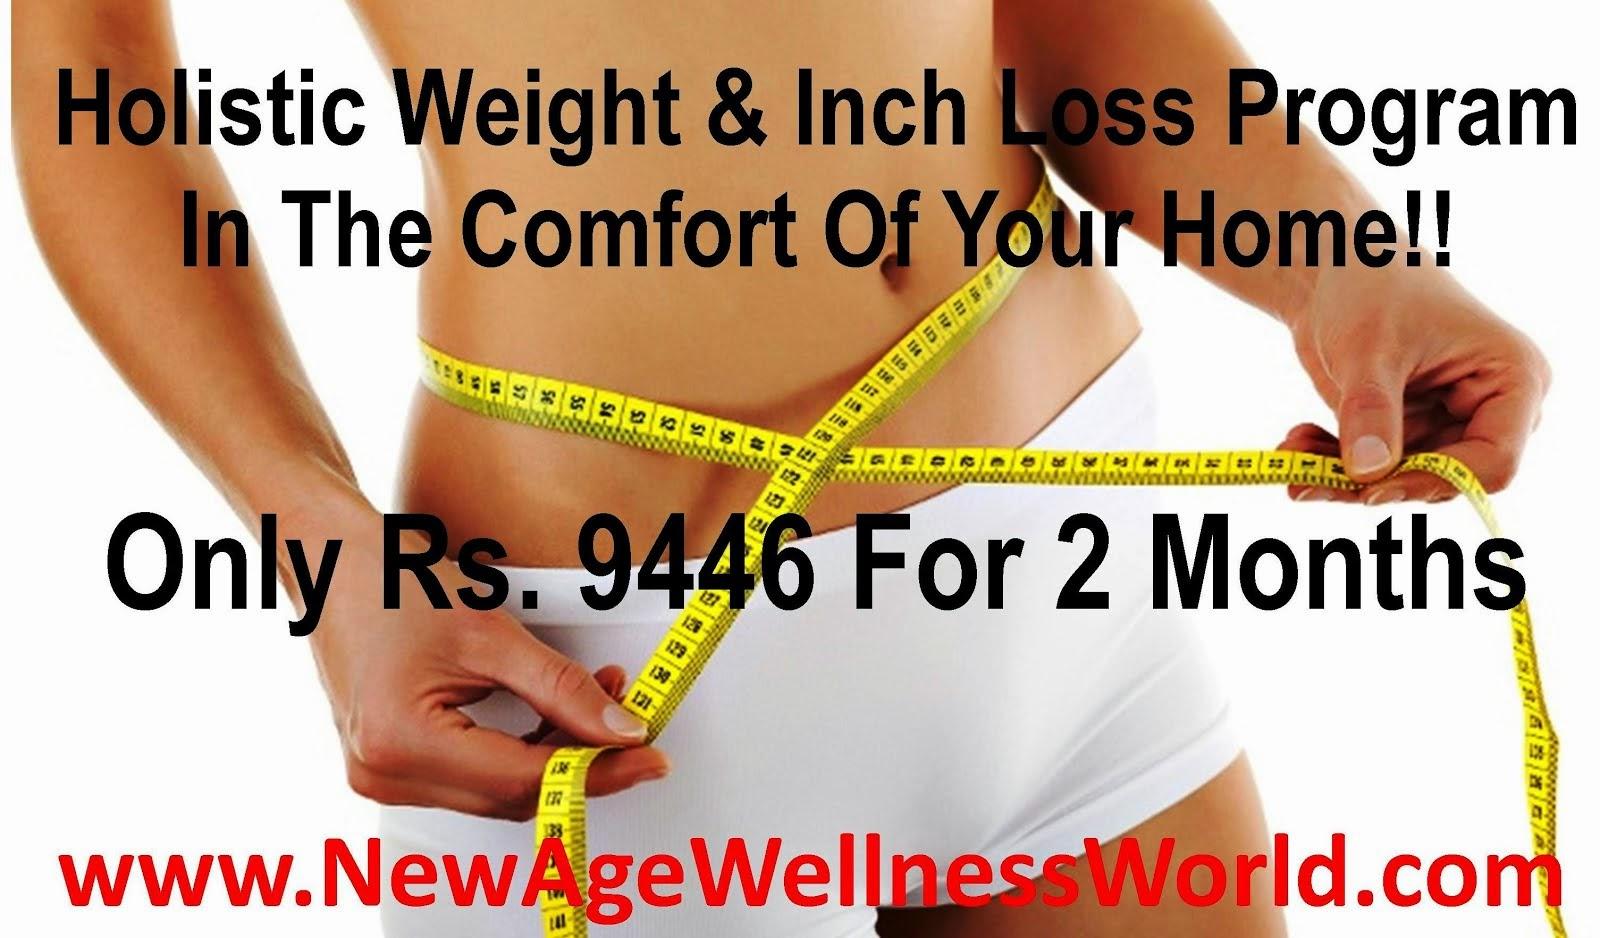 Super Weight & Inch Loss Program